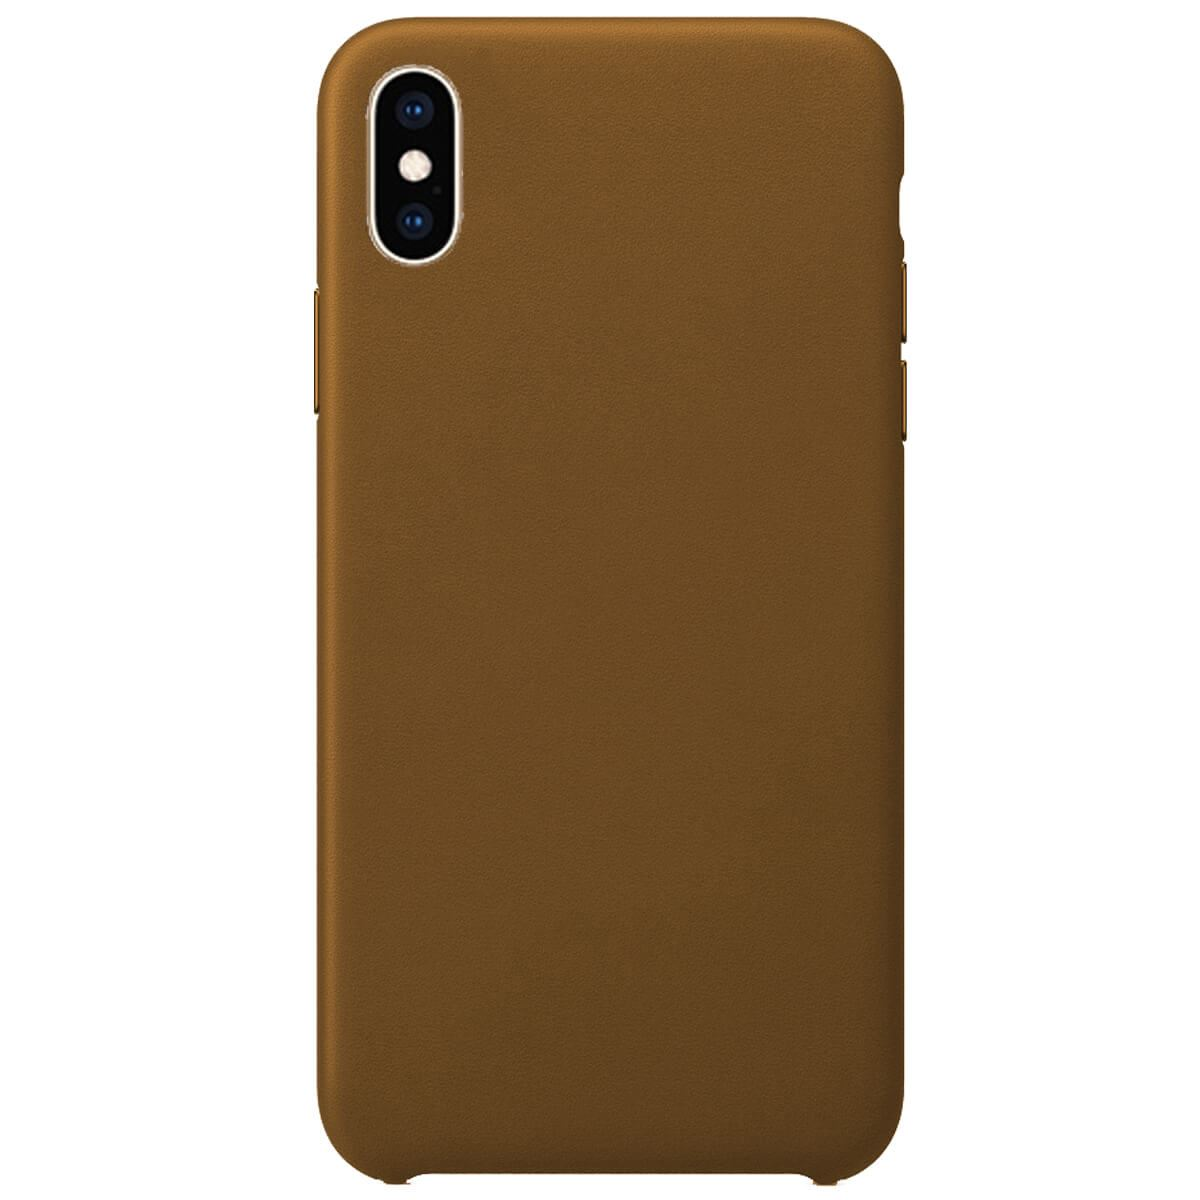 Leather-Slim-Case-Apple-iPhone-10-8-7-Plus-6s-5-Original-PU-Soft-Silicone-Cover thumbnail 13